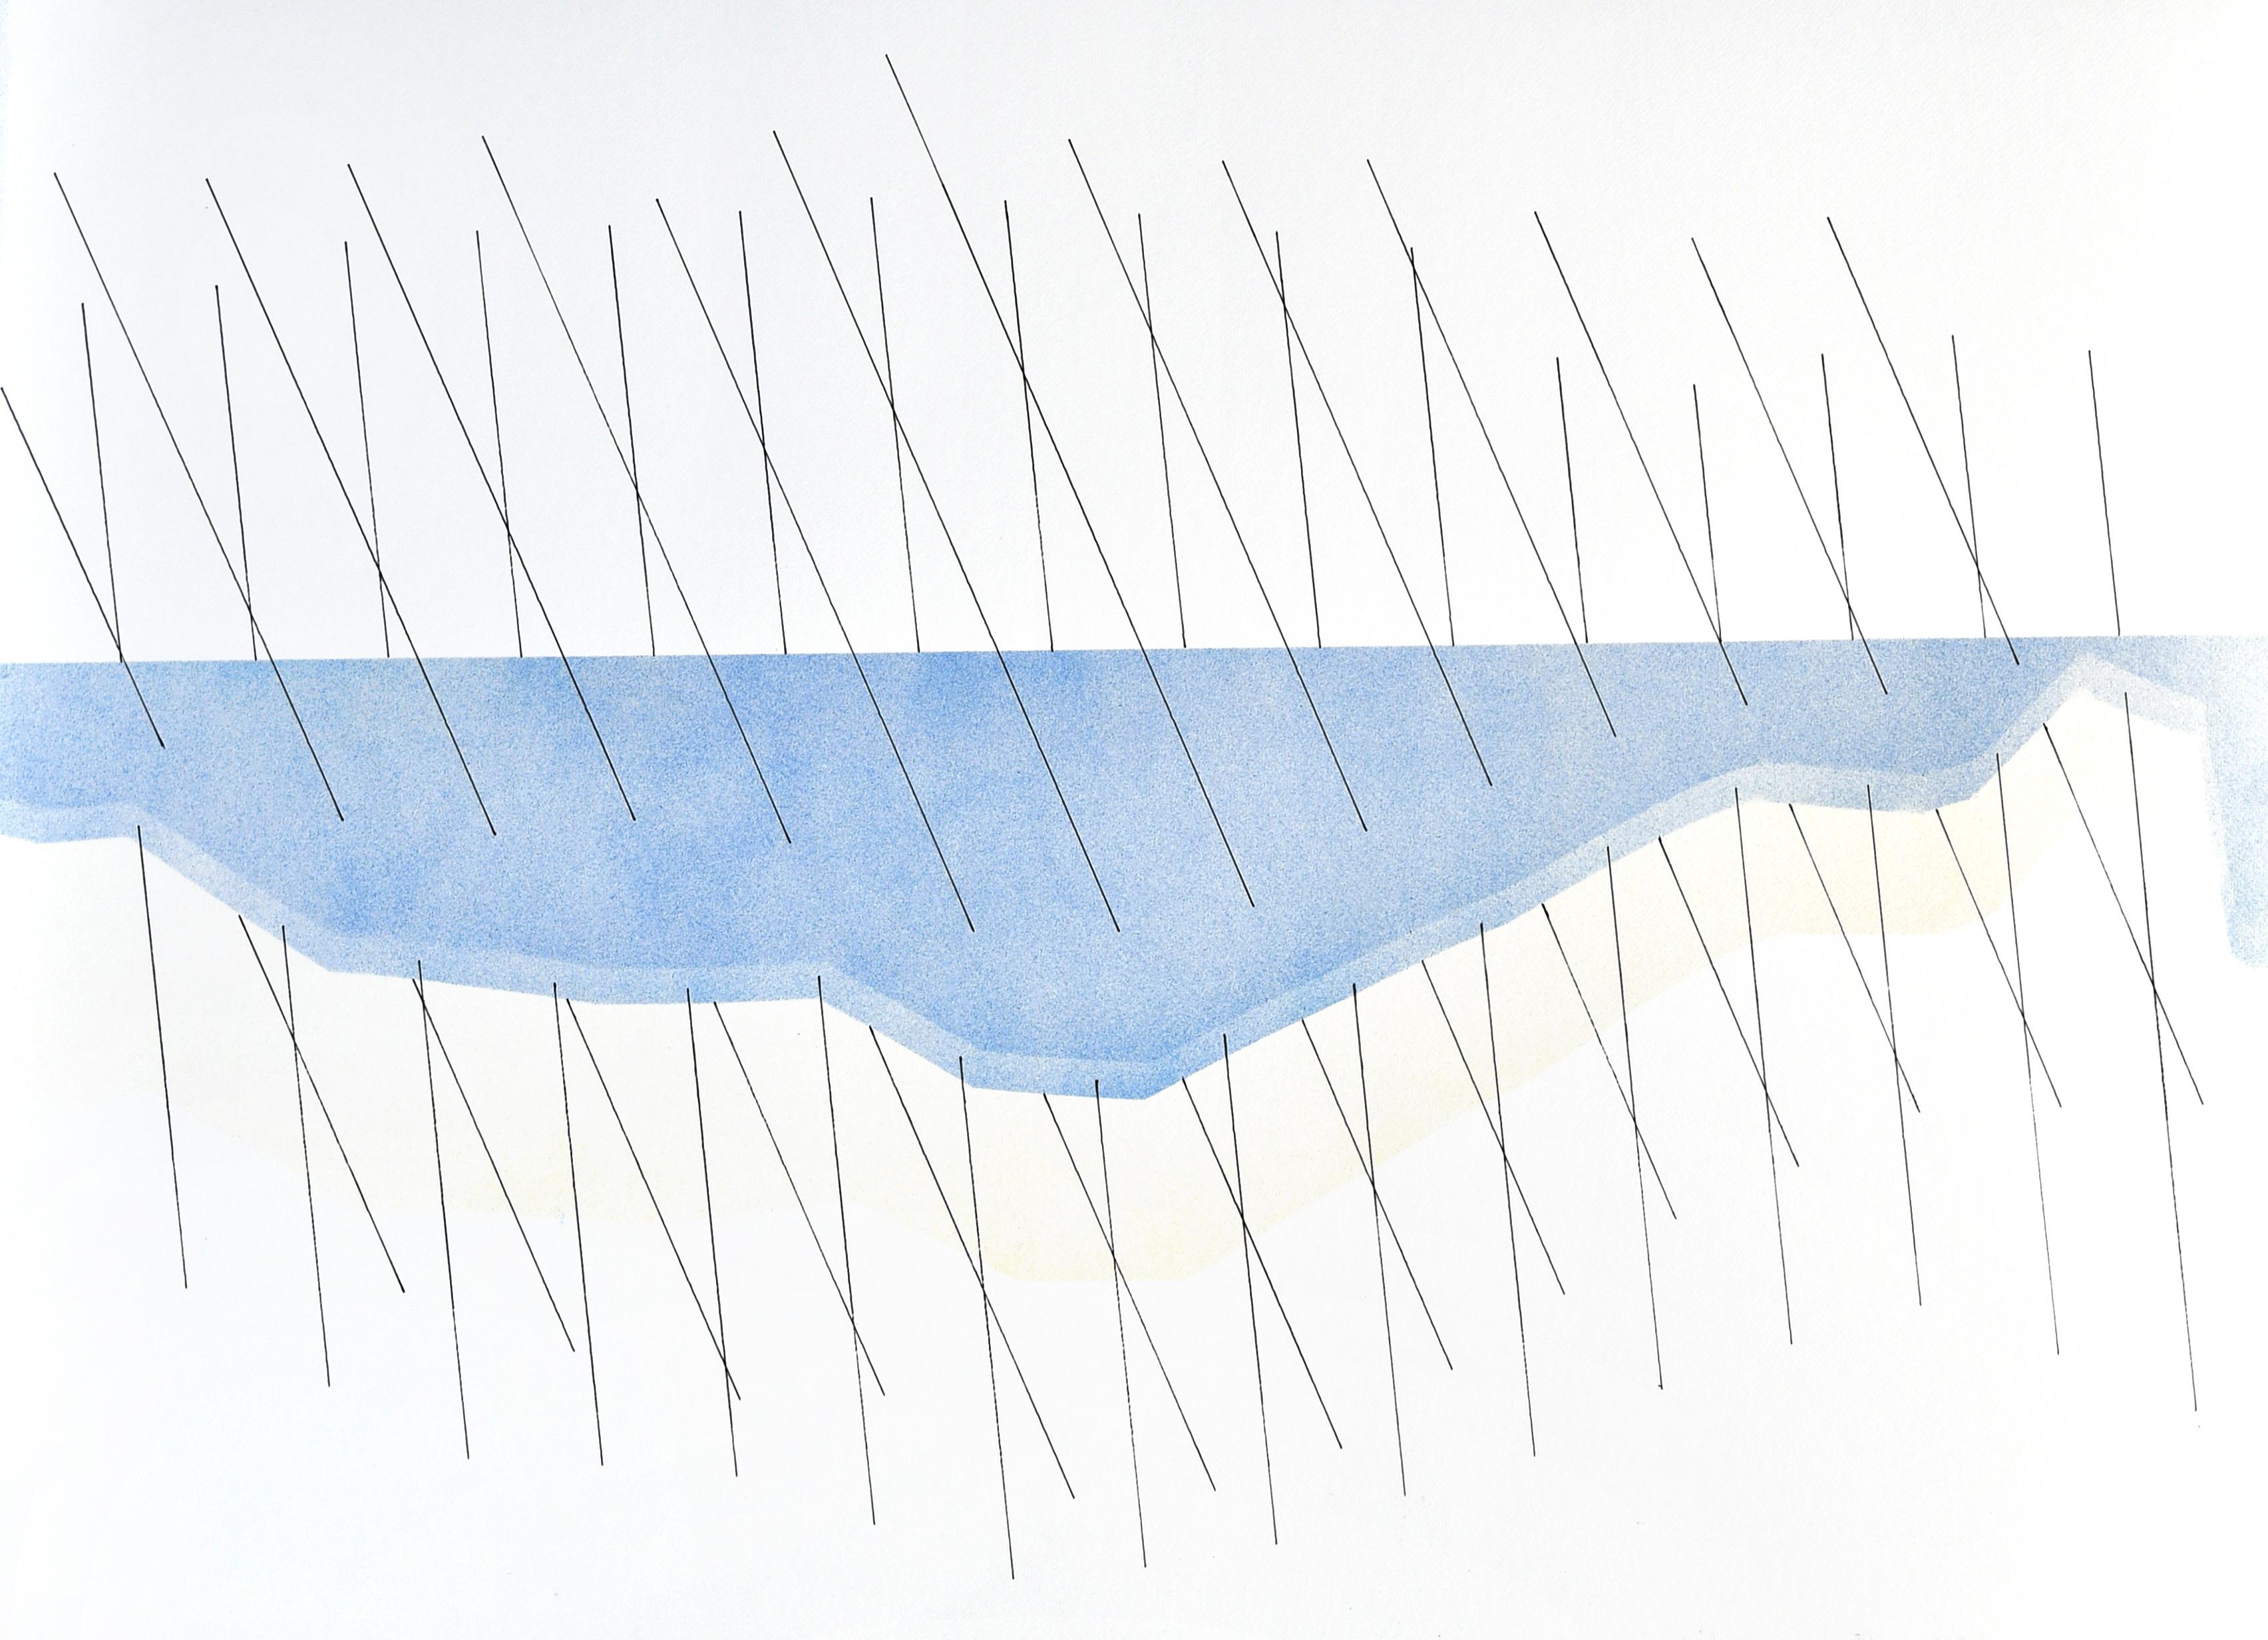 op040420 acrylic on paper, 75x105cm